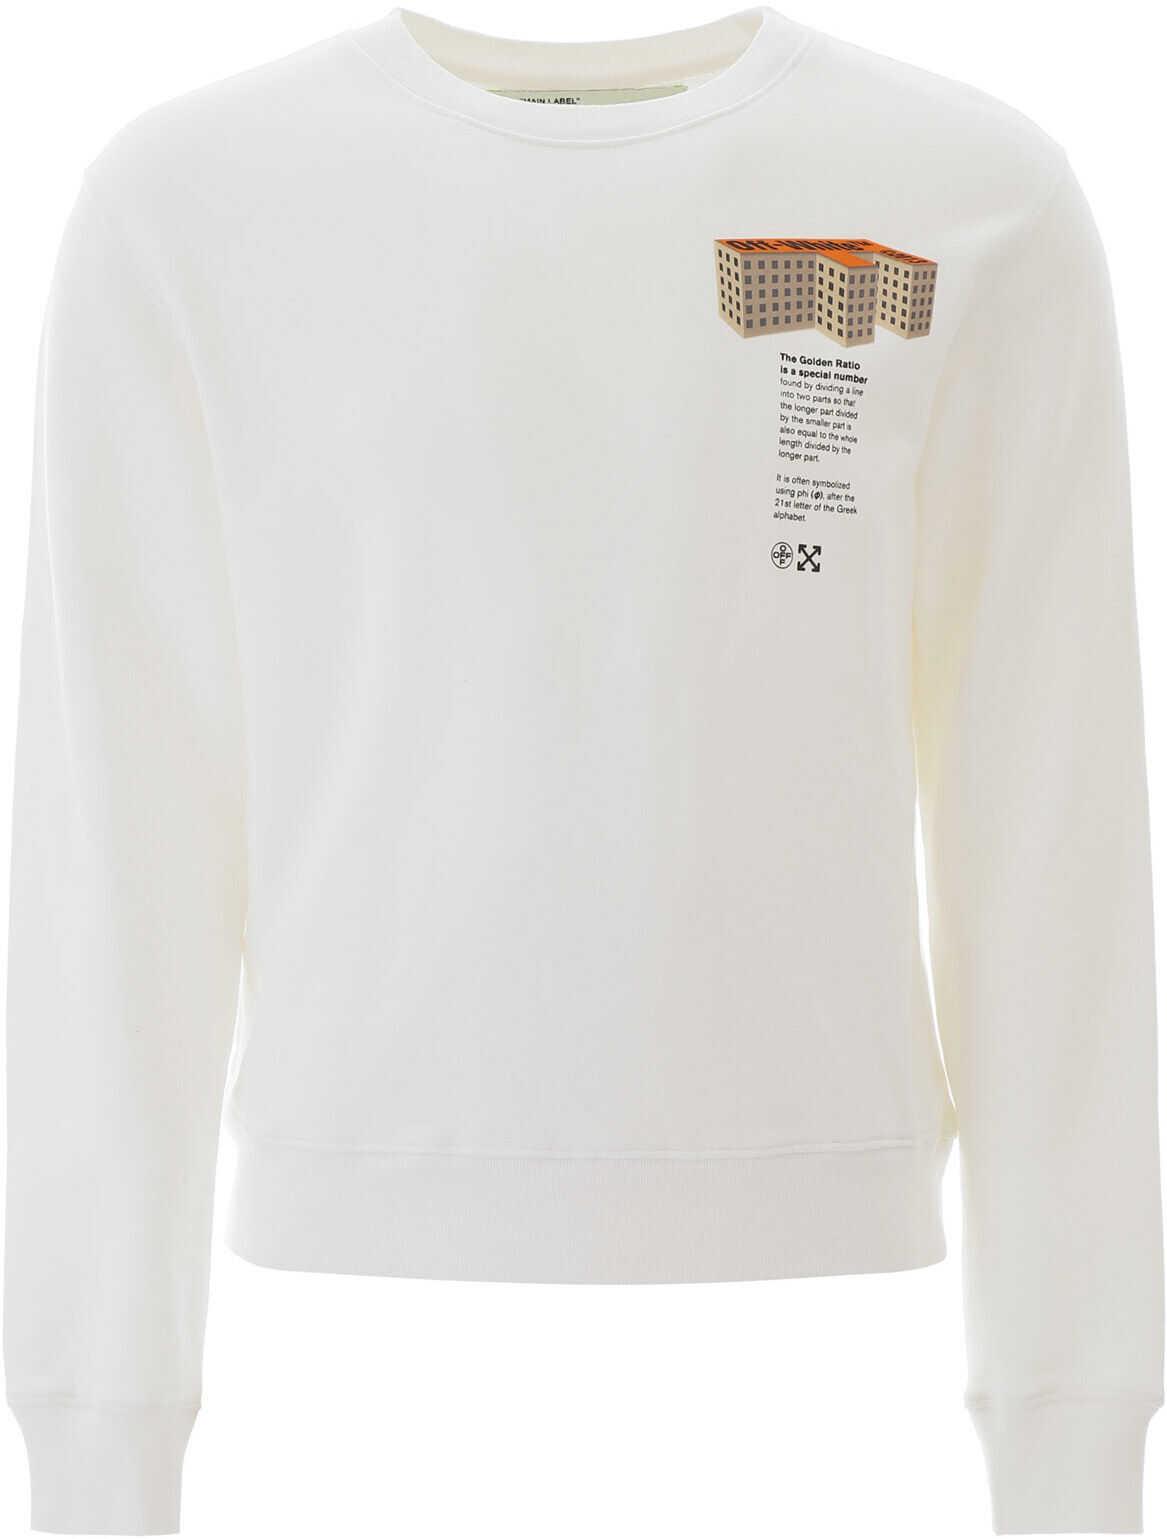 Off-White Building Print Sweatshirt WHITE MULTI